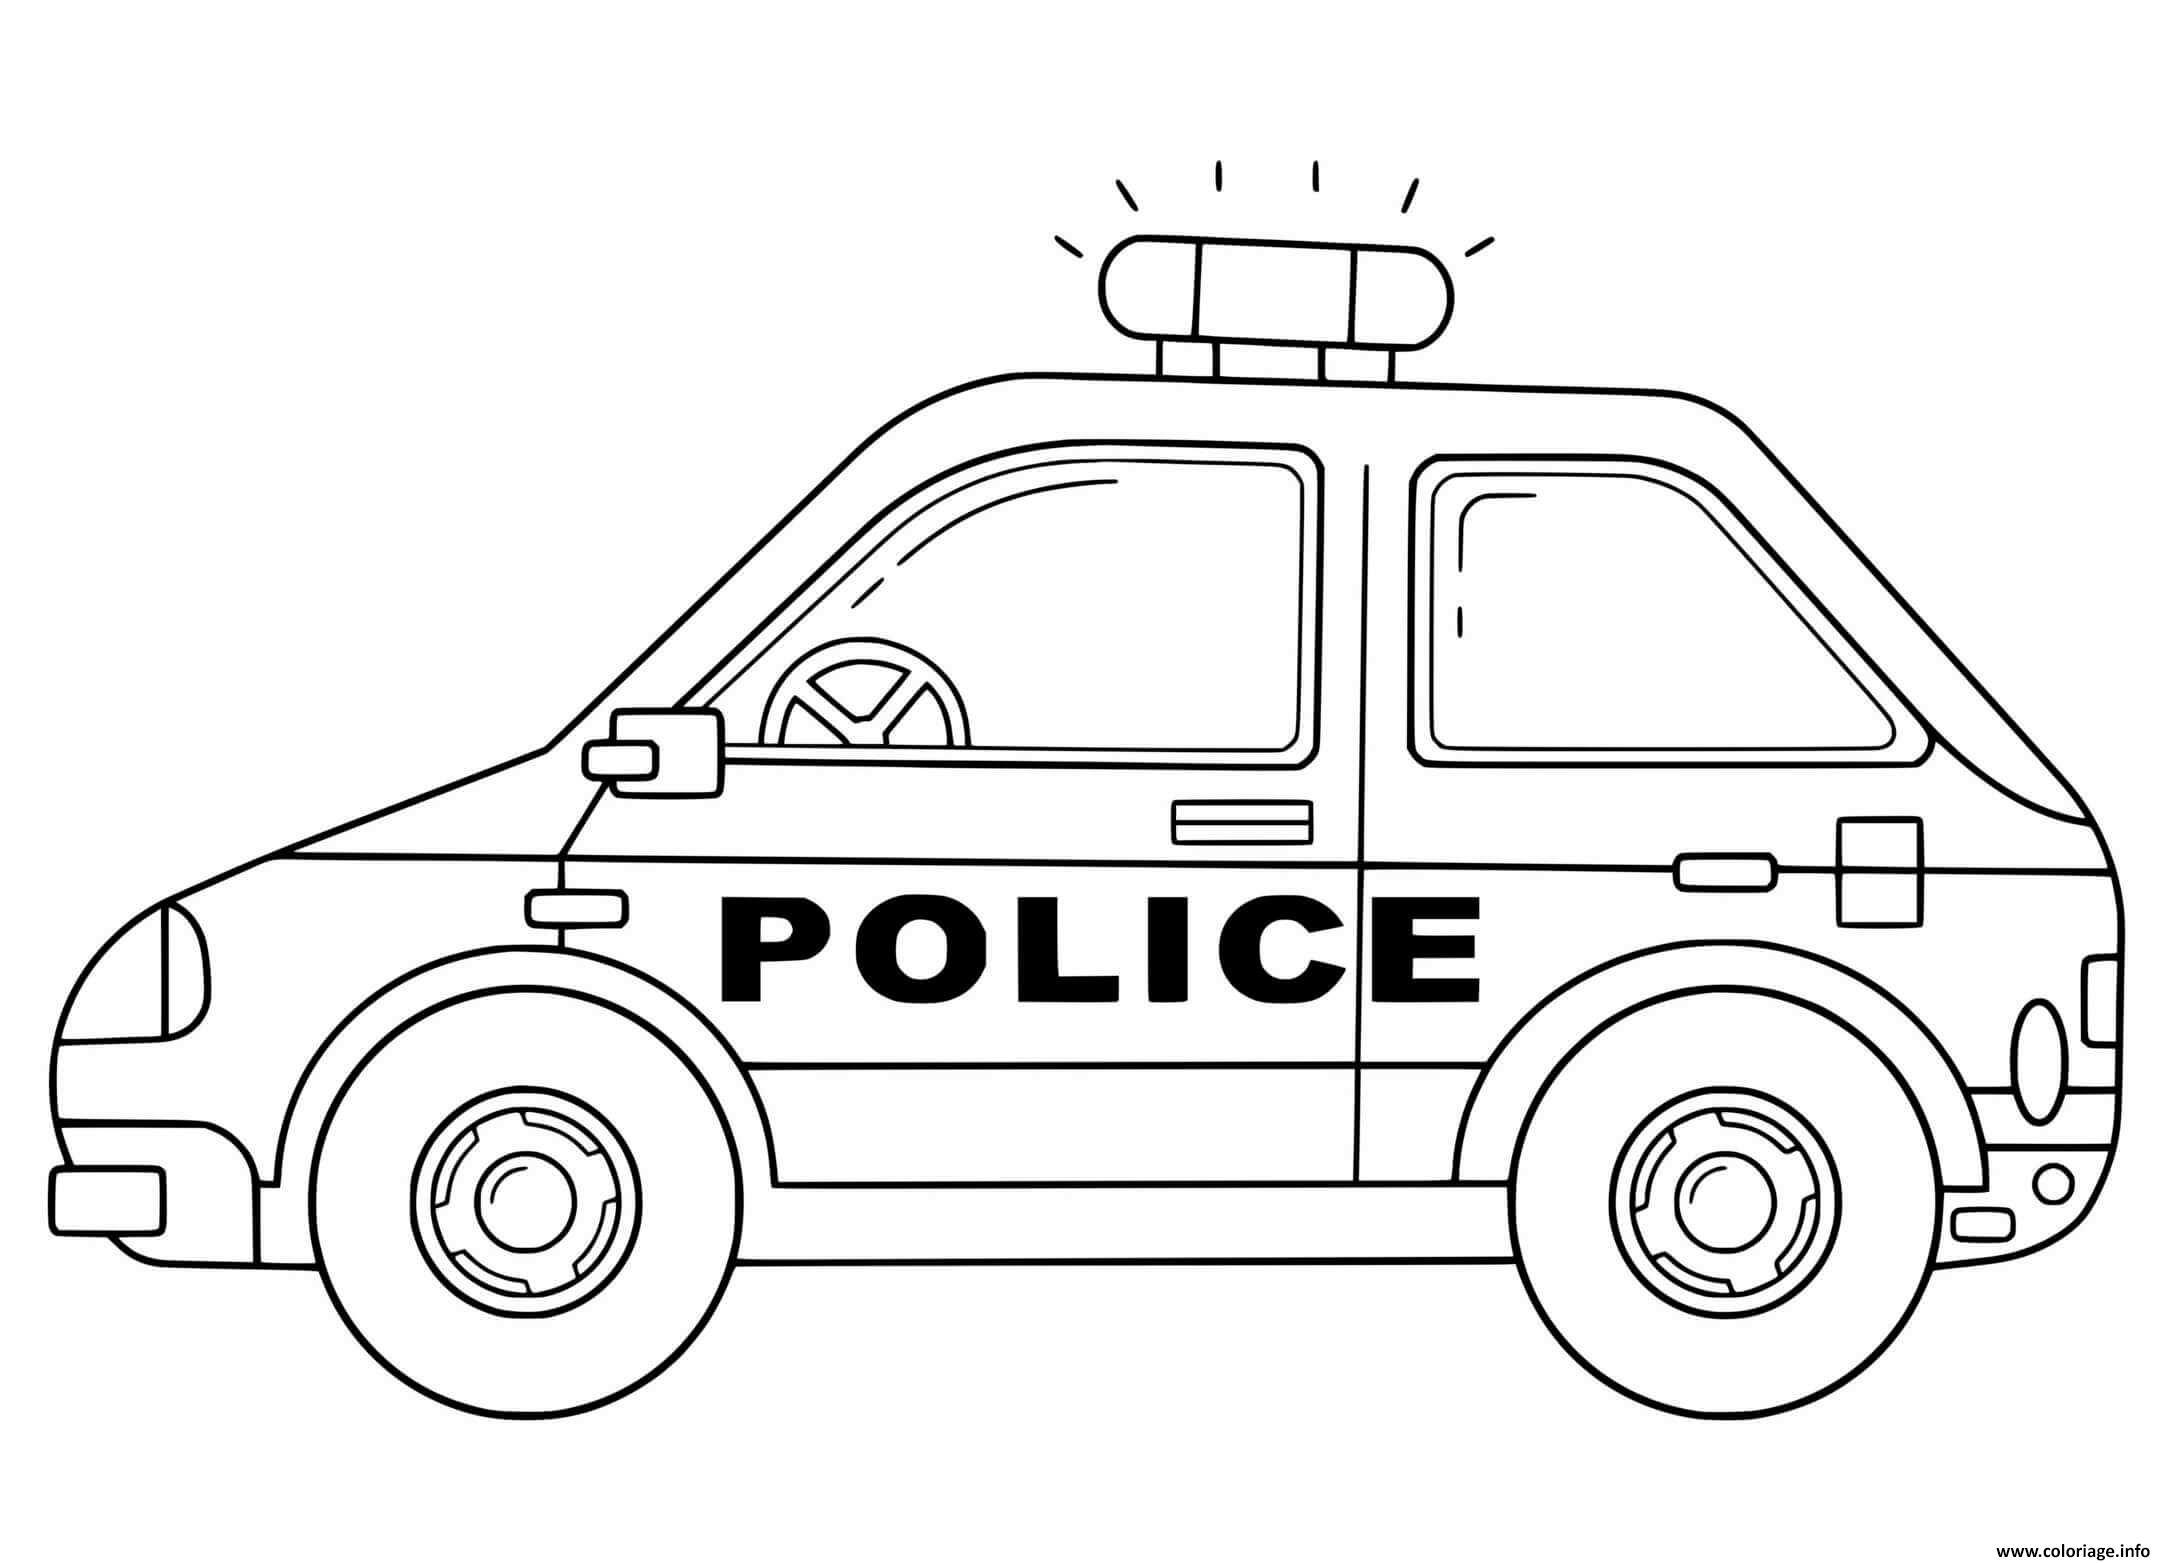 Coloriage Voiture De Police Nationale France Dessin Voiture De Police A Imprimer